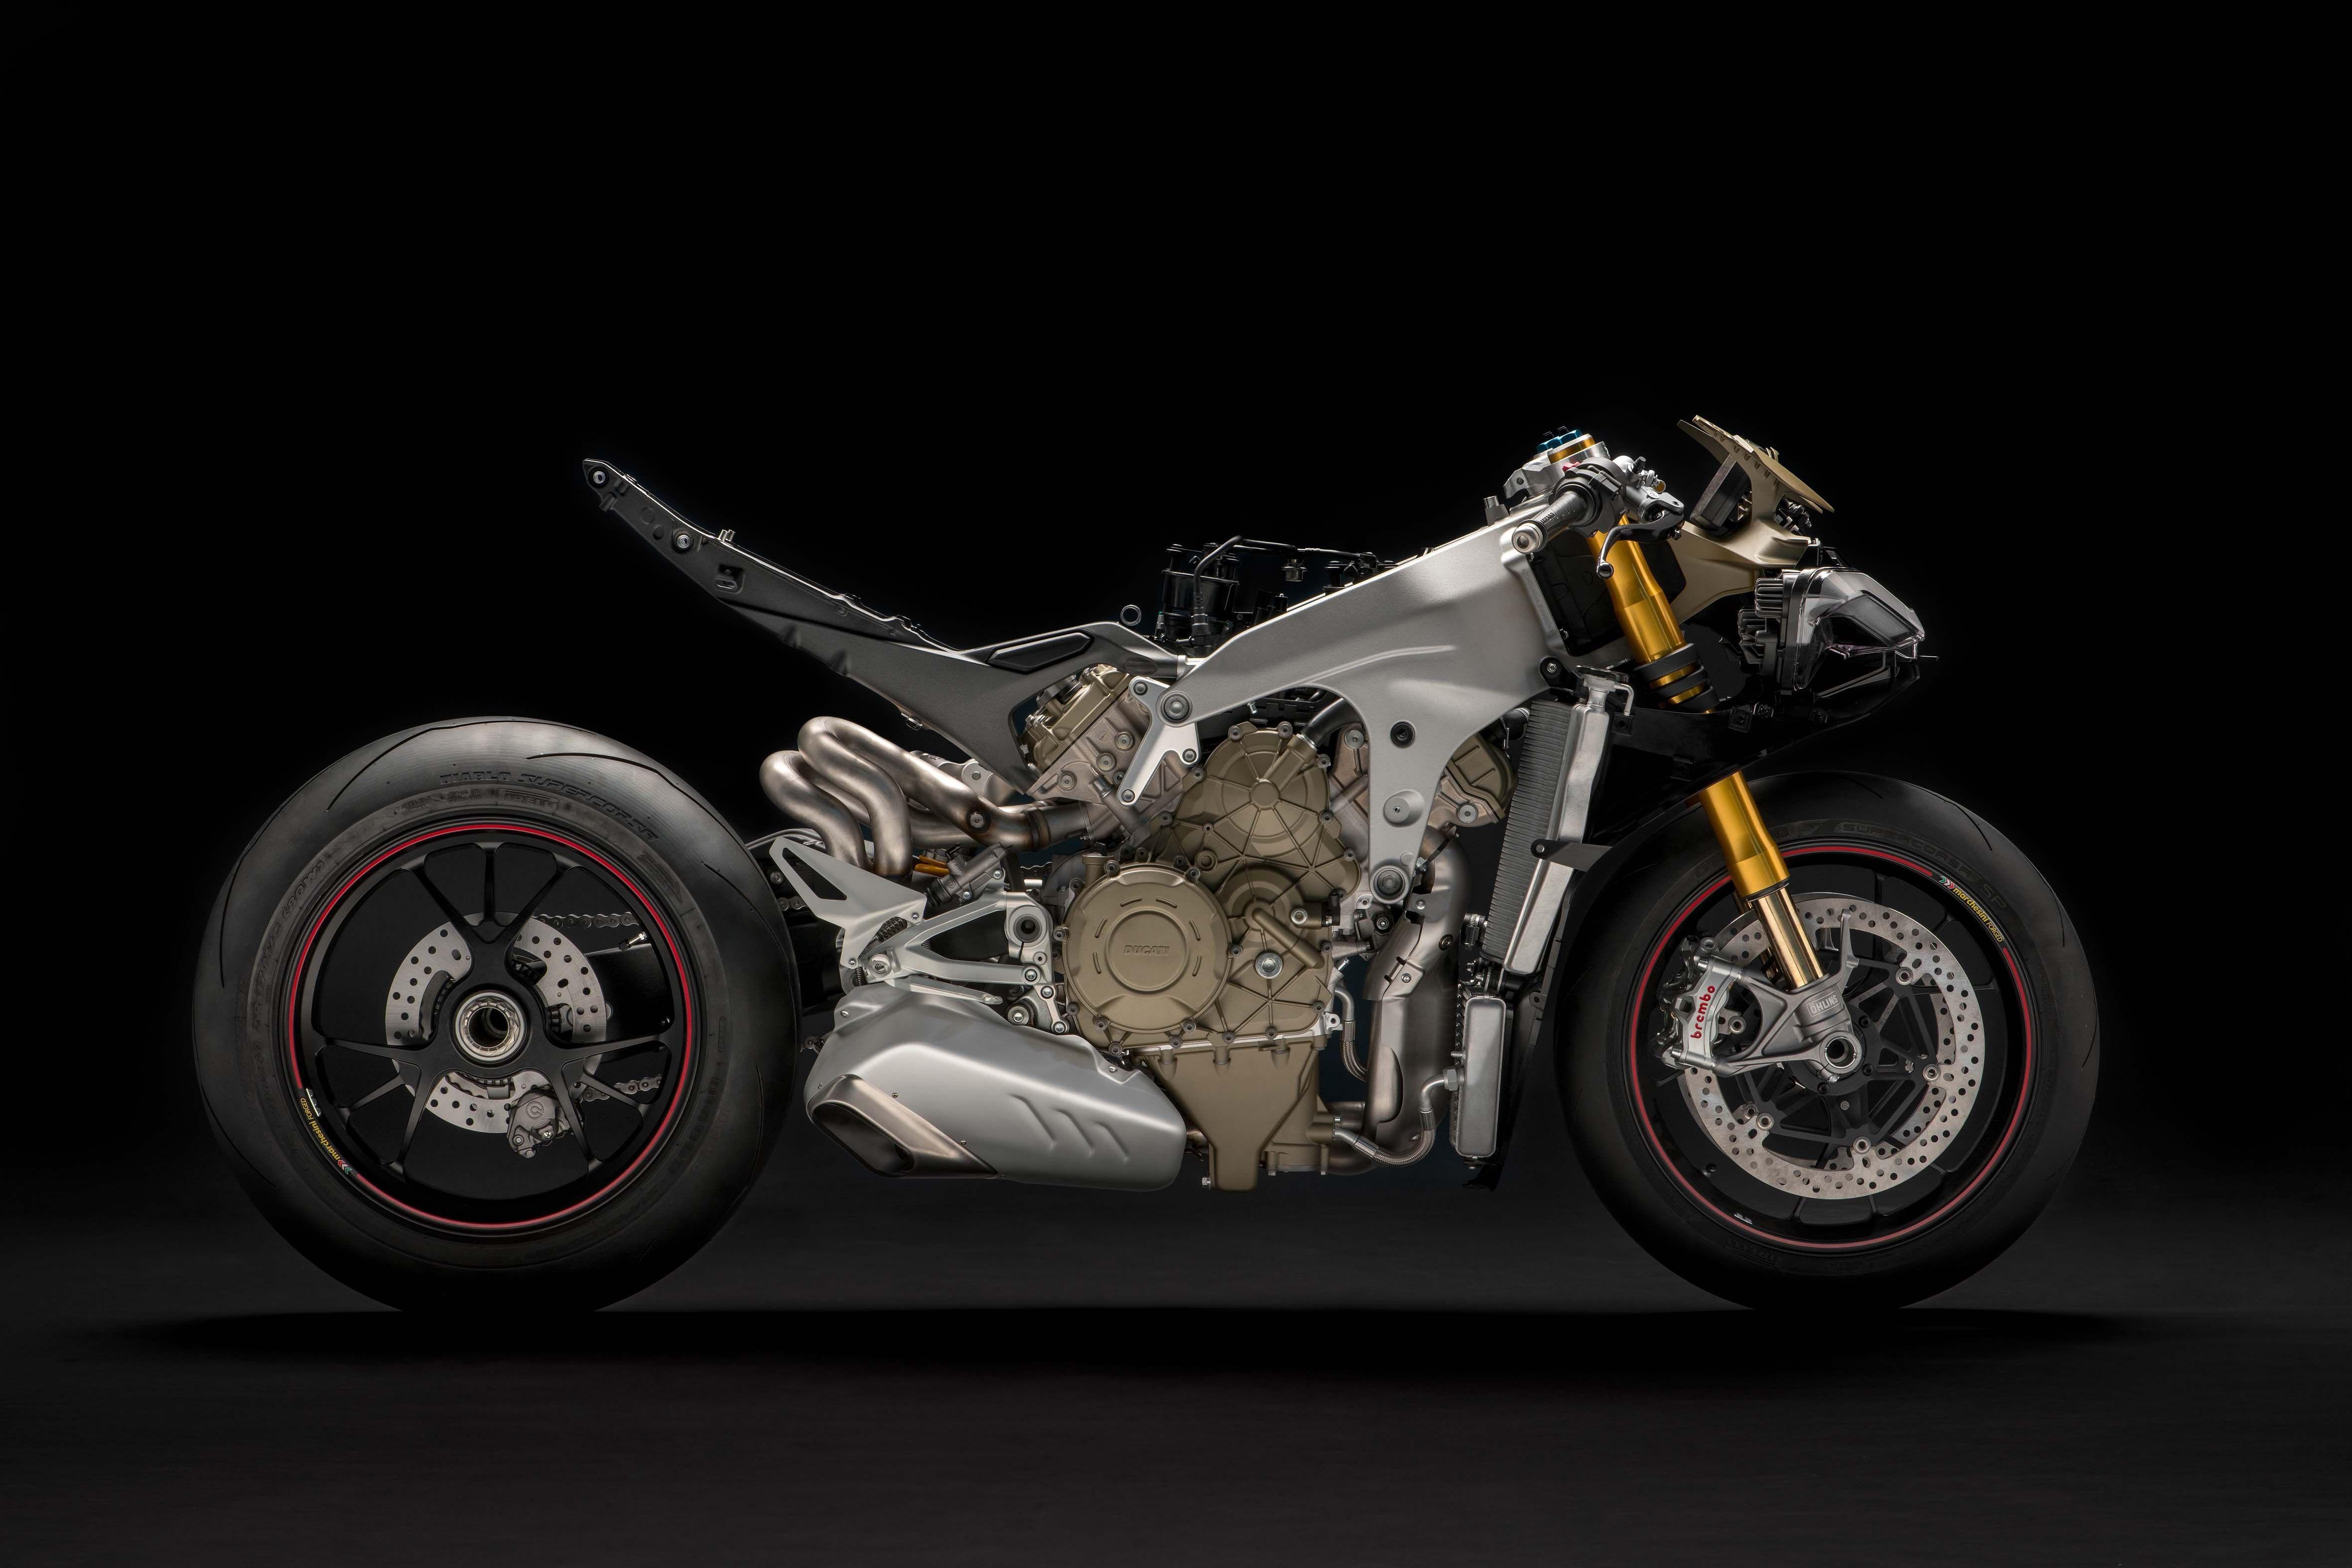 Ducati Panigale V4 2018 Naked Moto Preparation Specials